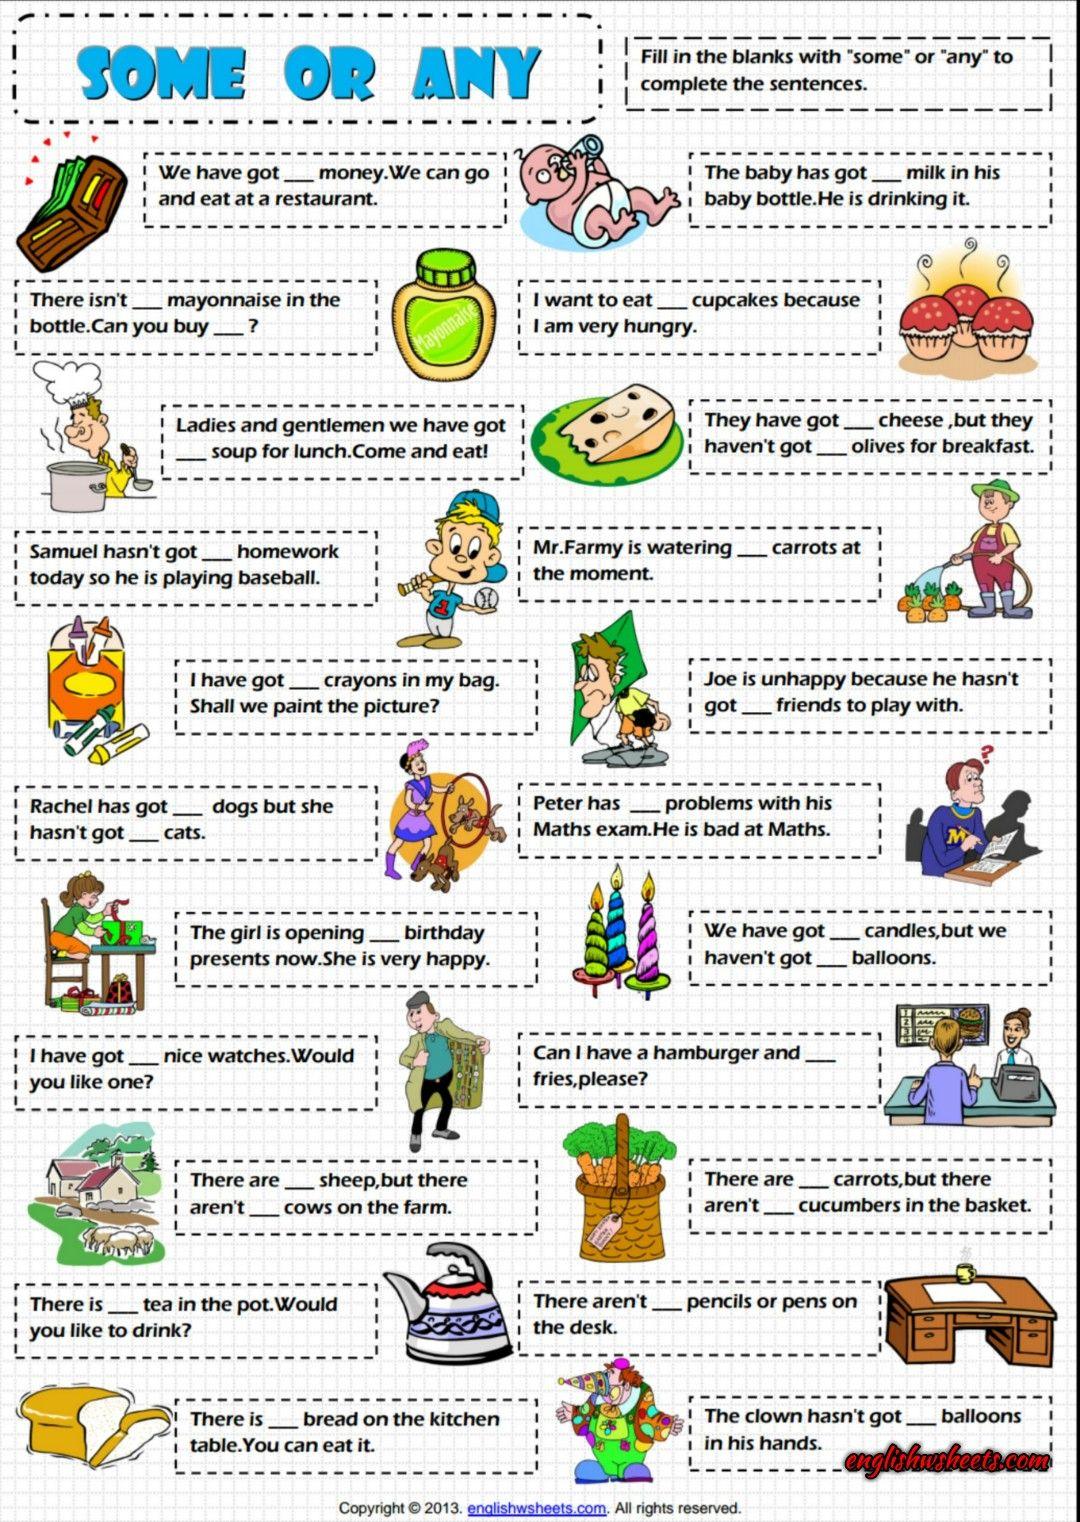 Some Or Any Esl Grammar Exercise Worksheet